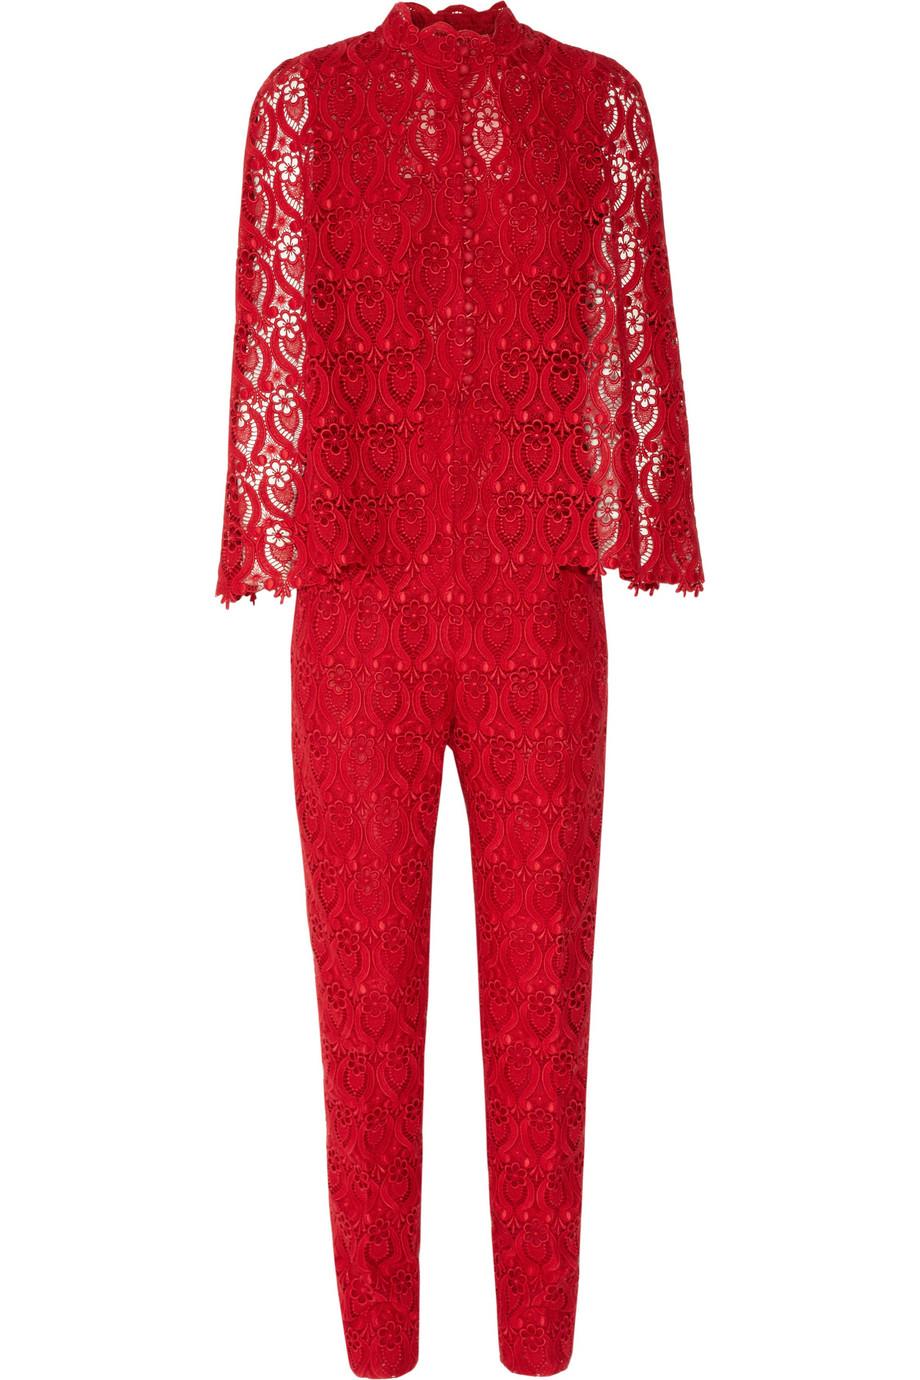 Valentino Macramlace Jumpsuit In Red Lyst